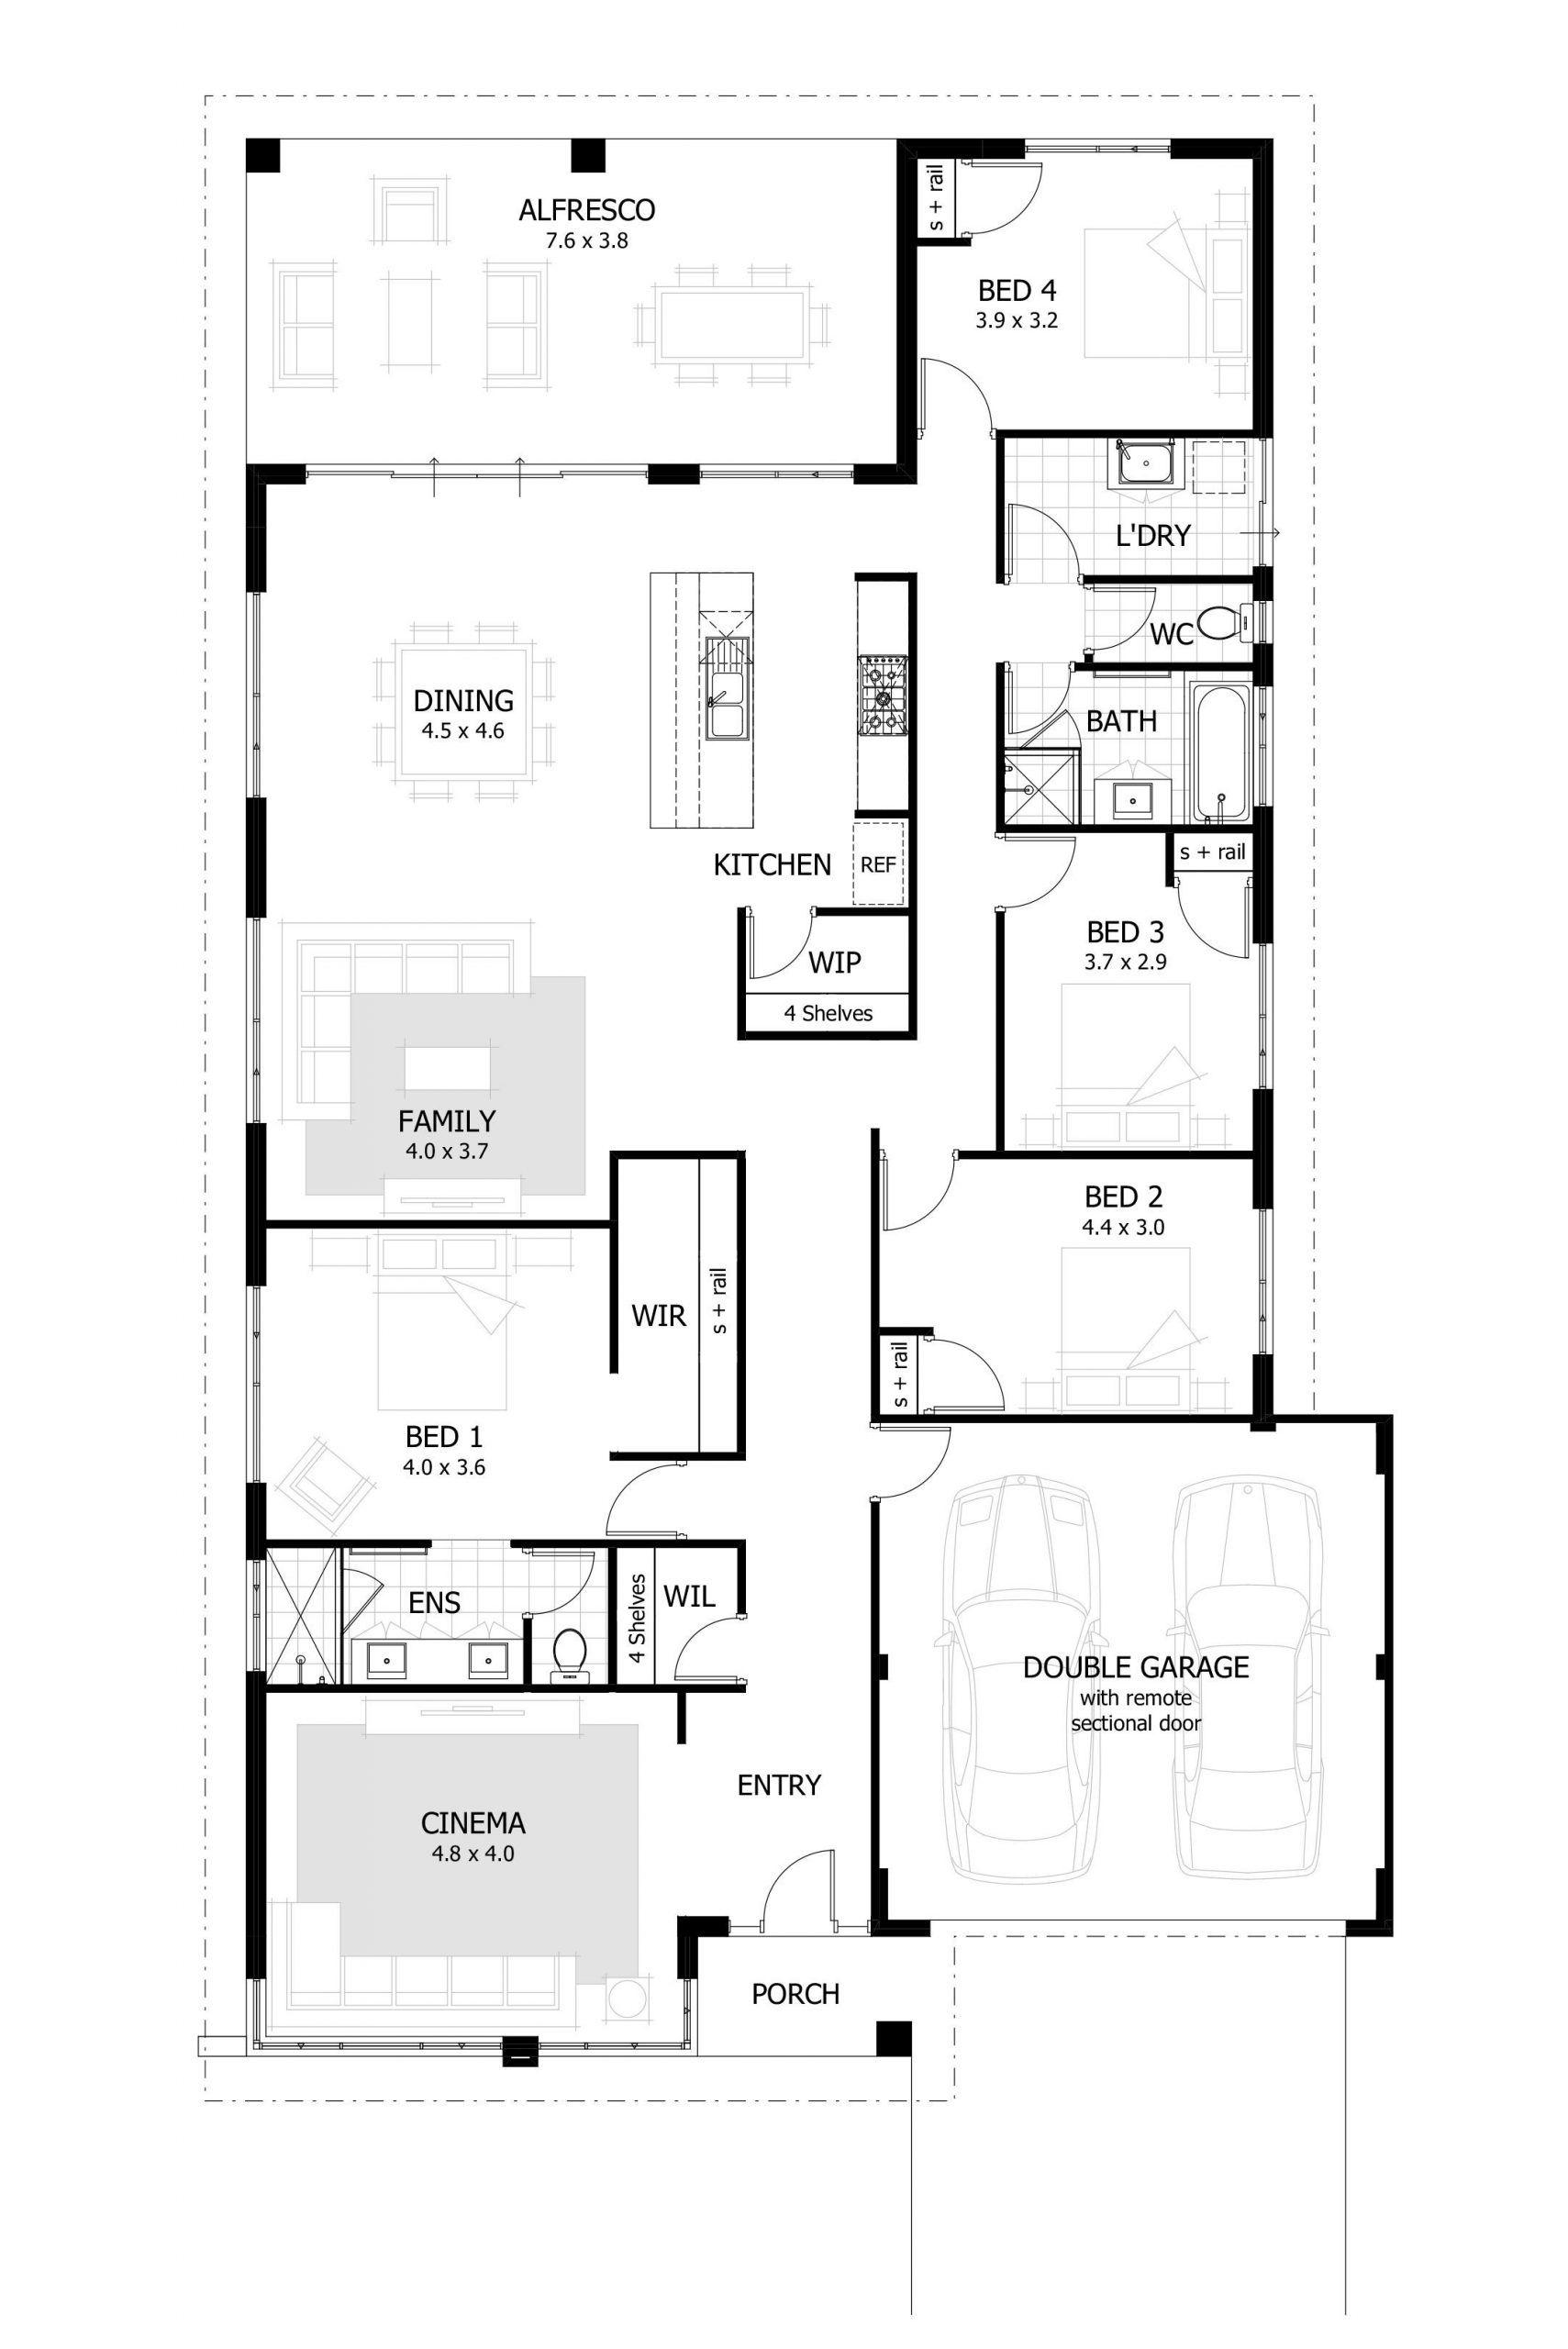 Best Open Floor Plans 2017 2021 Home Design Floor Plans House Plans Australia 4 Bedroom House Plans